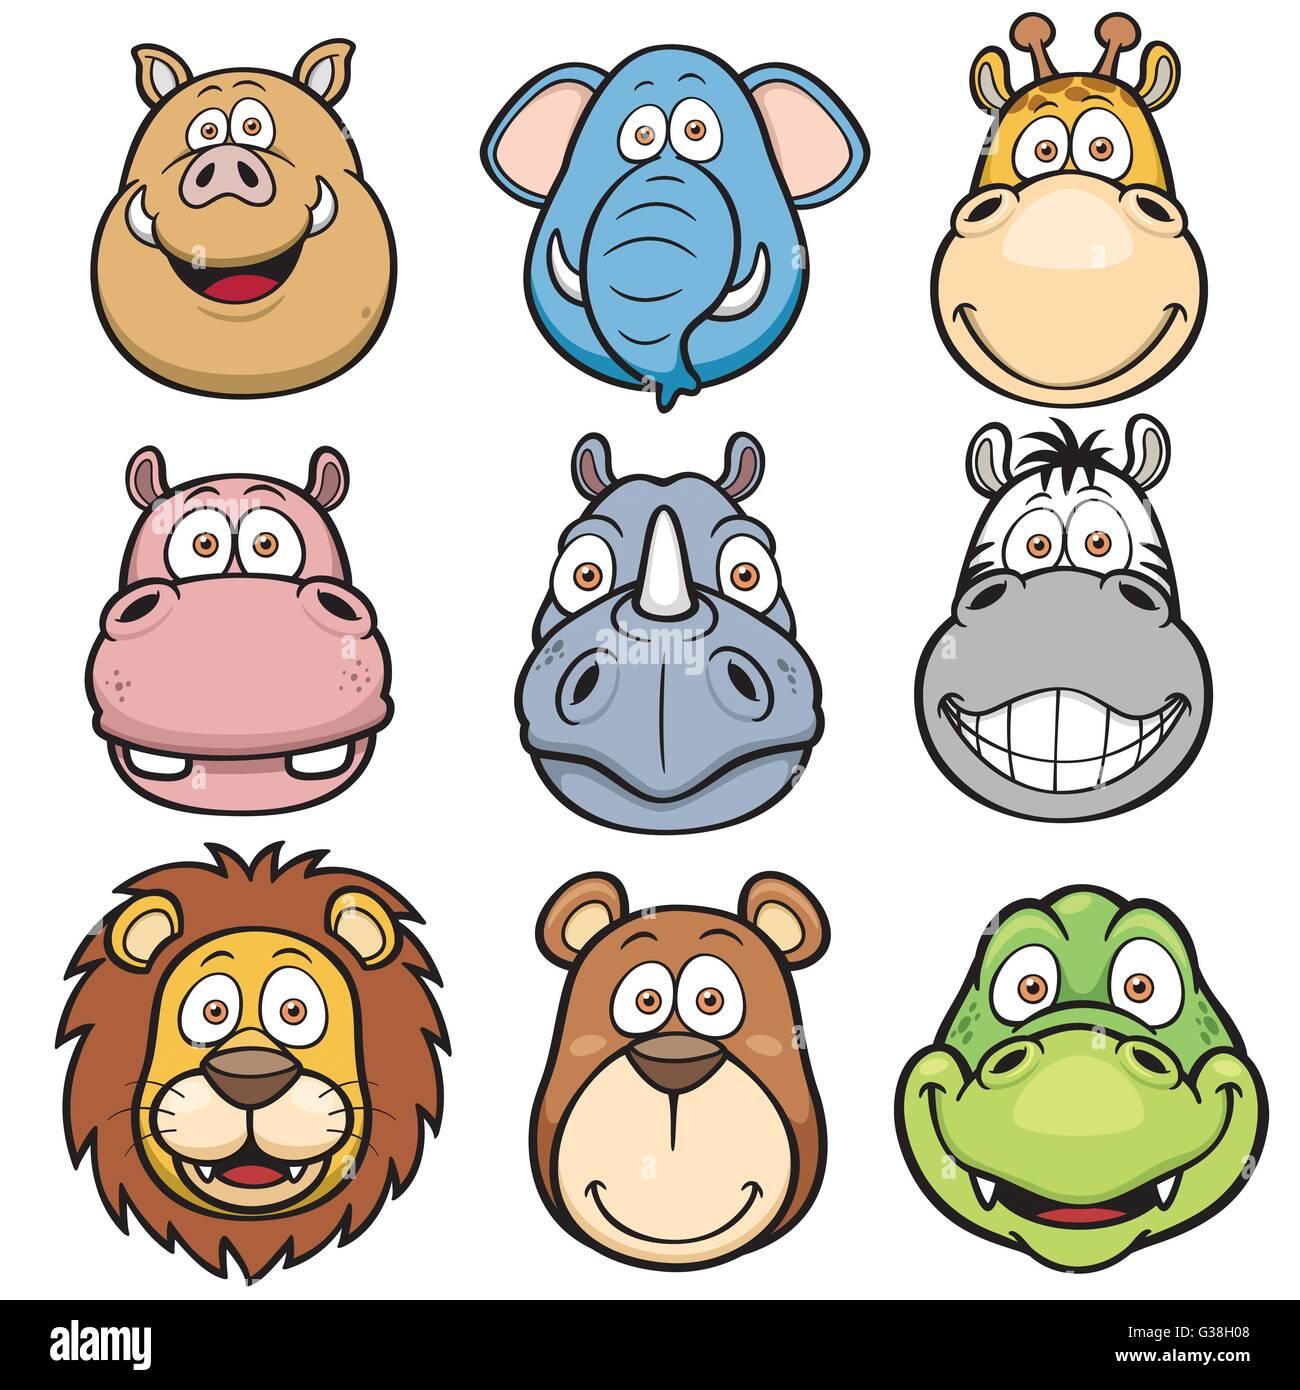 vector illustration of wild animals faces cartoons stock vector art